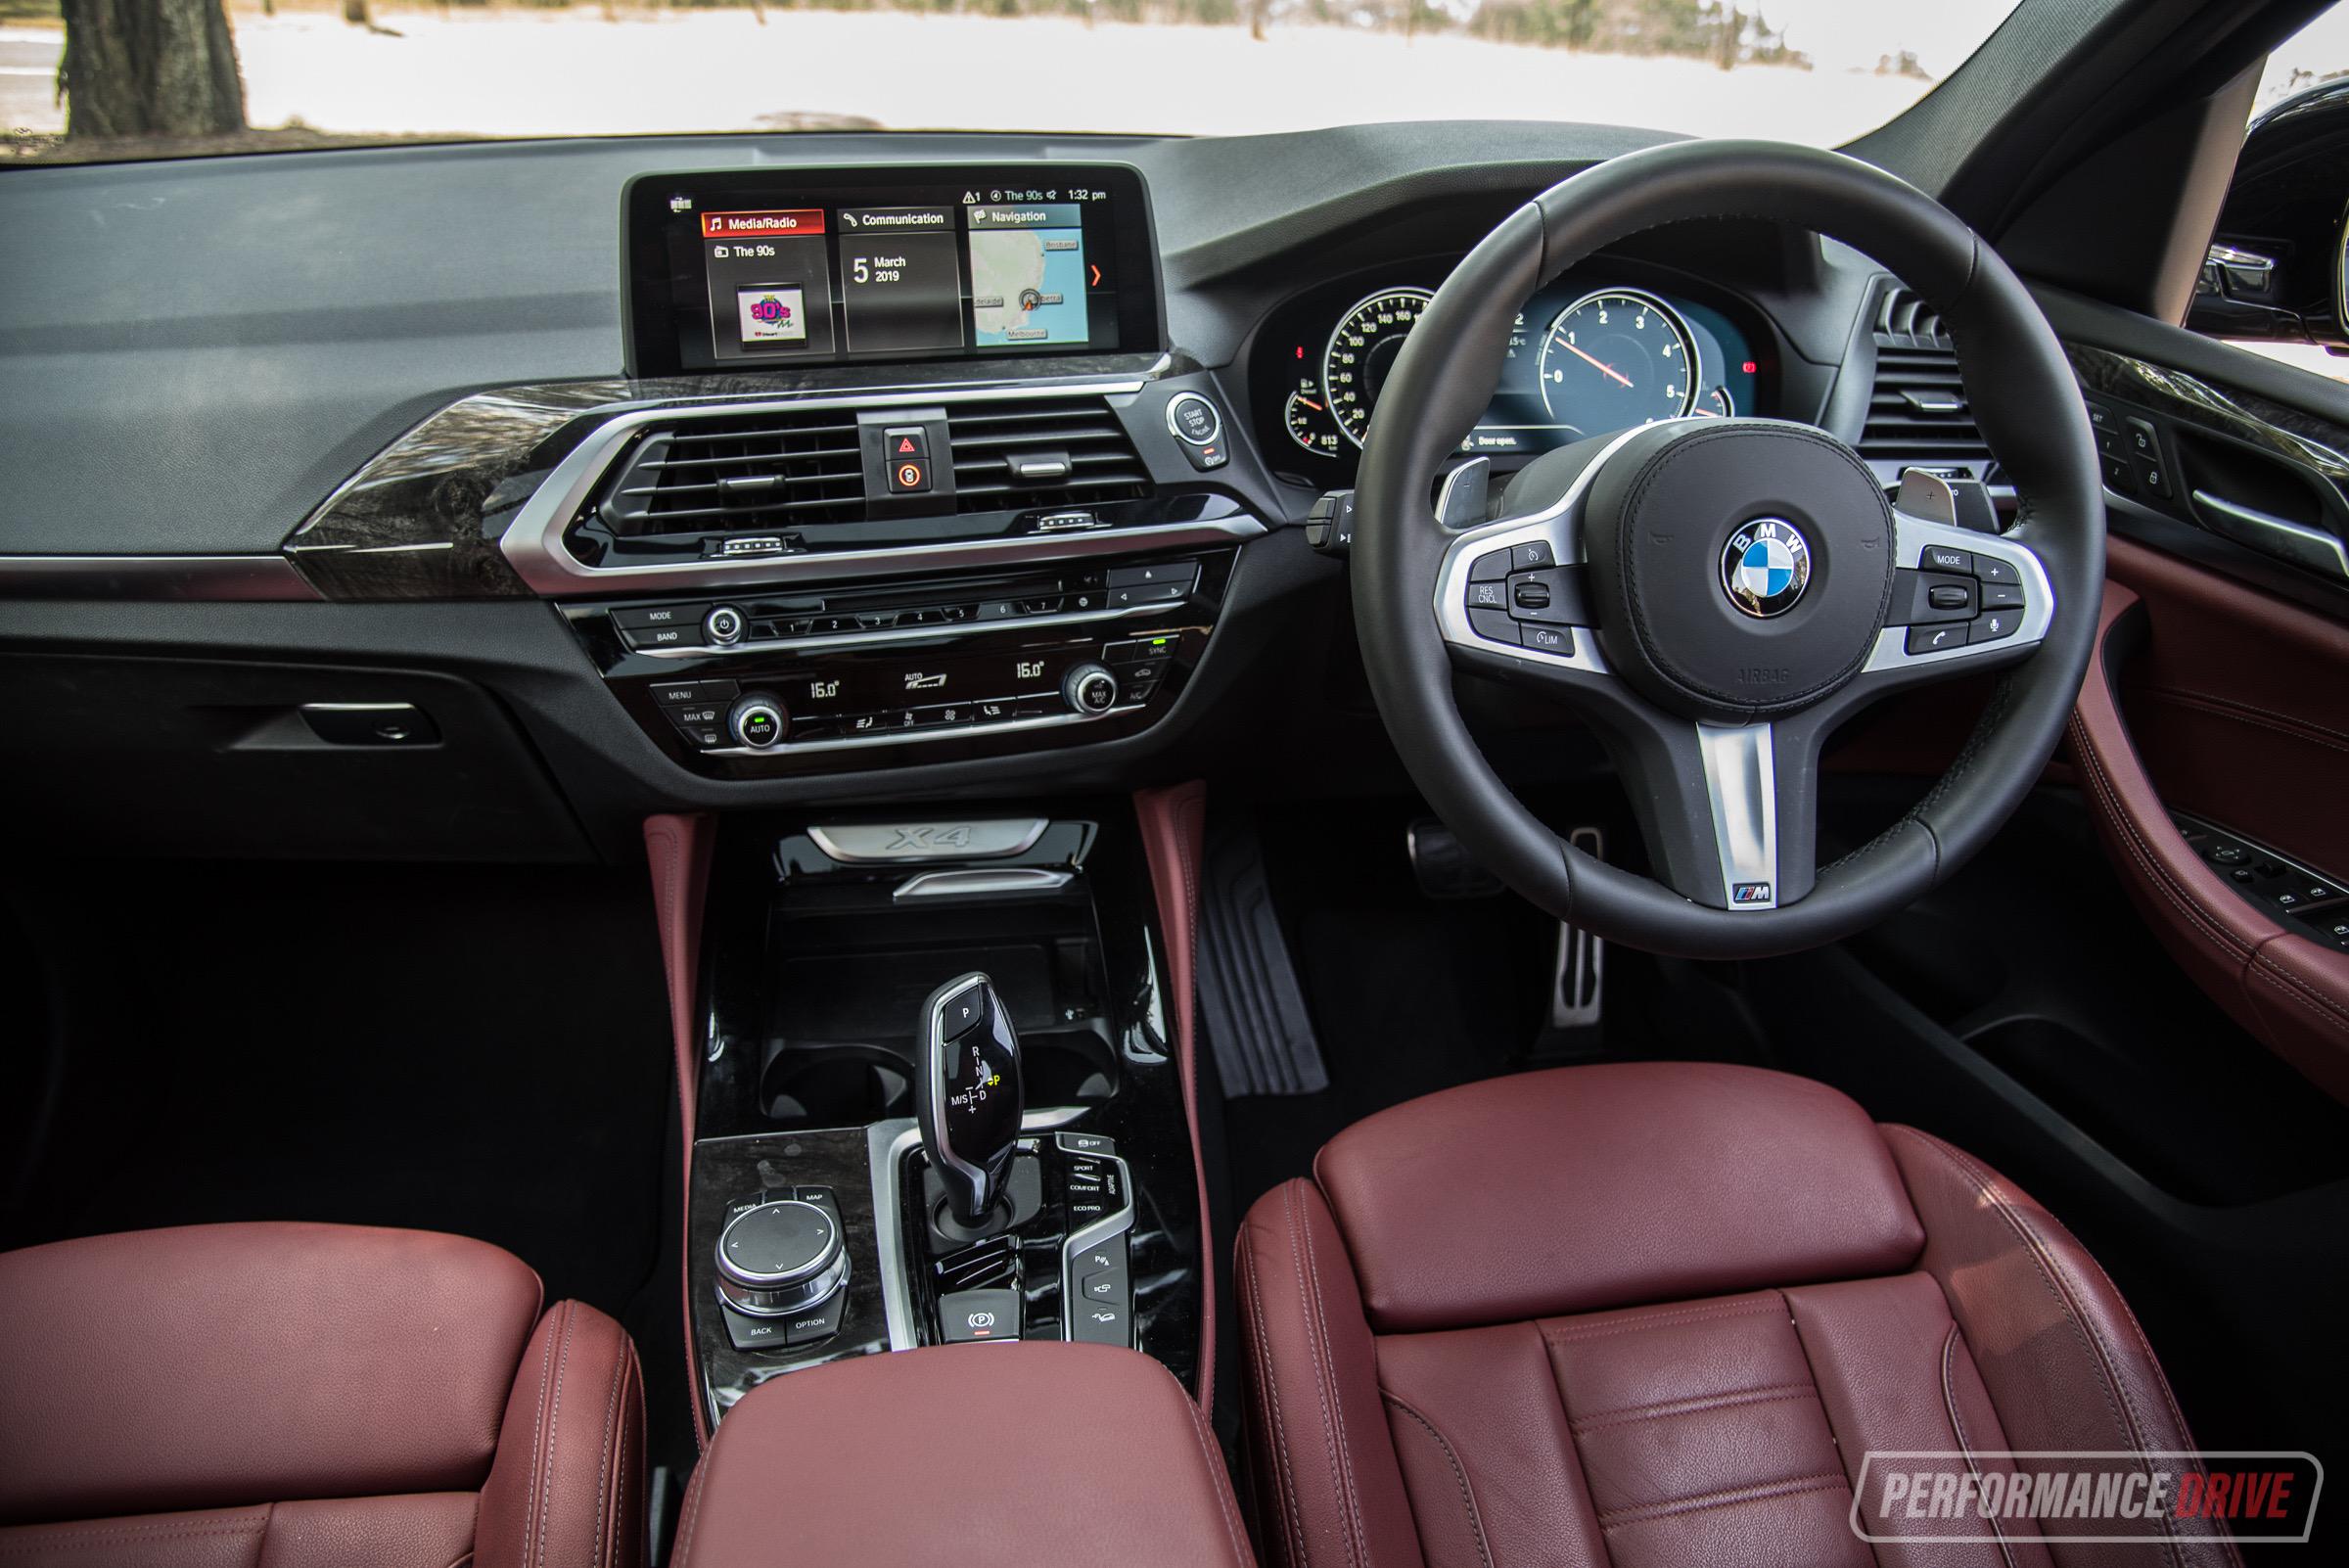 2019 Bmw X4 Xdrive20d M Sport Review Video Performancedrive